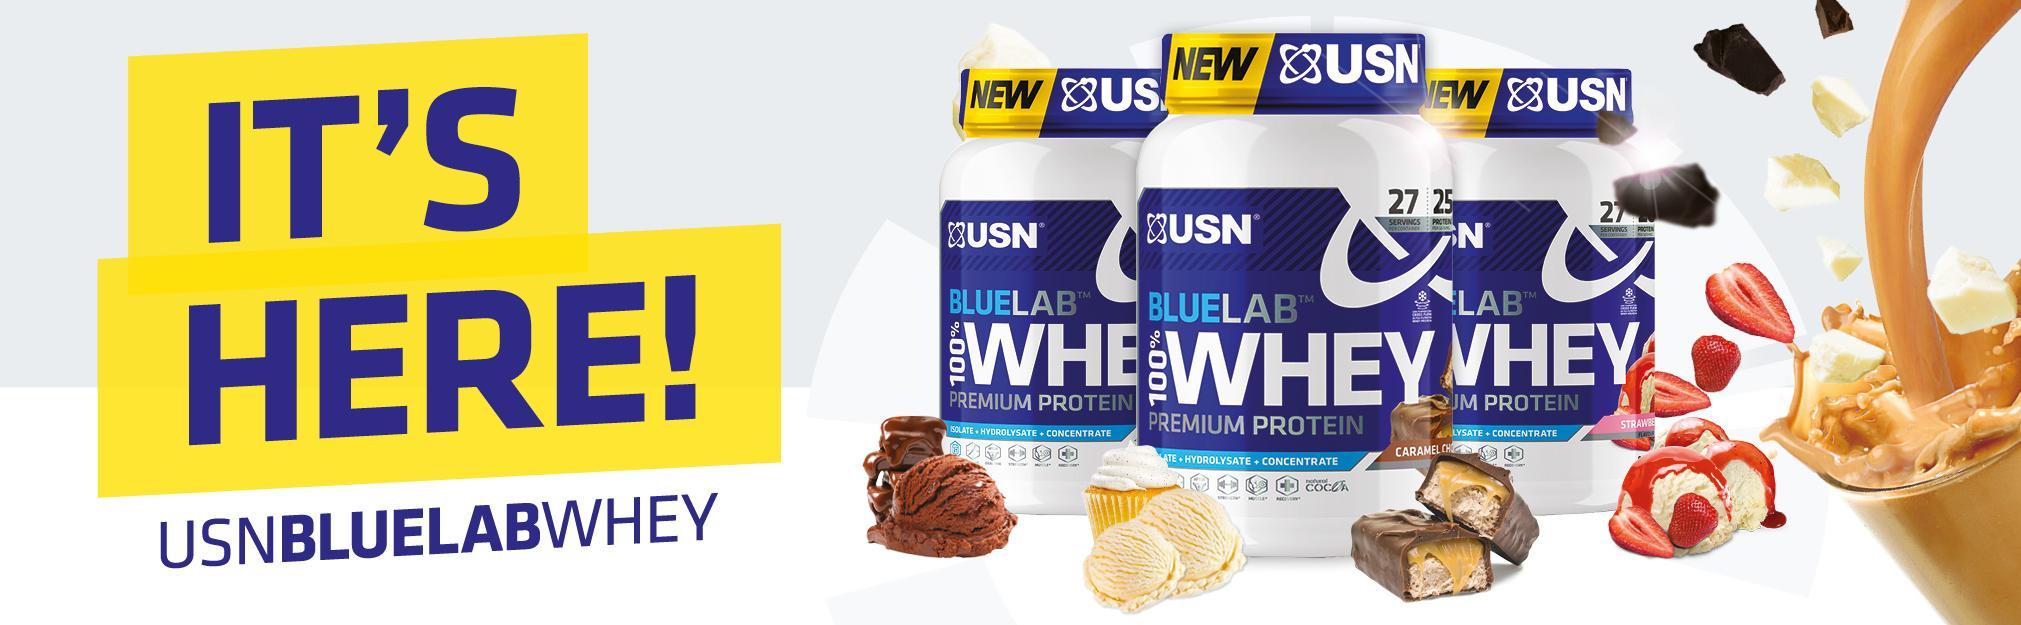 USN Blue Lab 100% Whey Premium Protein Shake Powder, 2kg, Caramel Chocolate